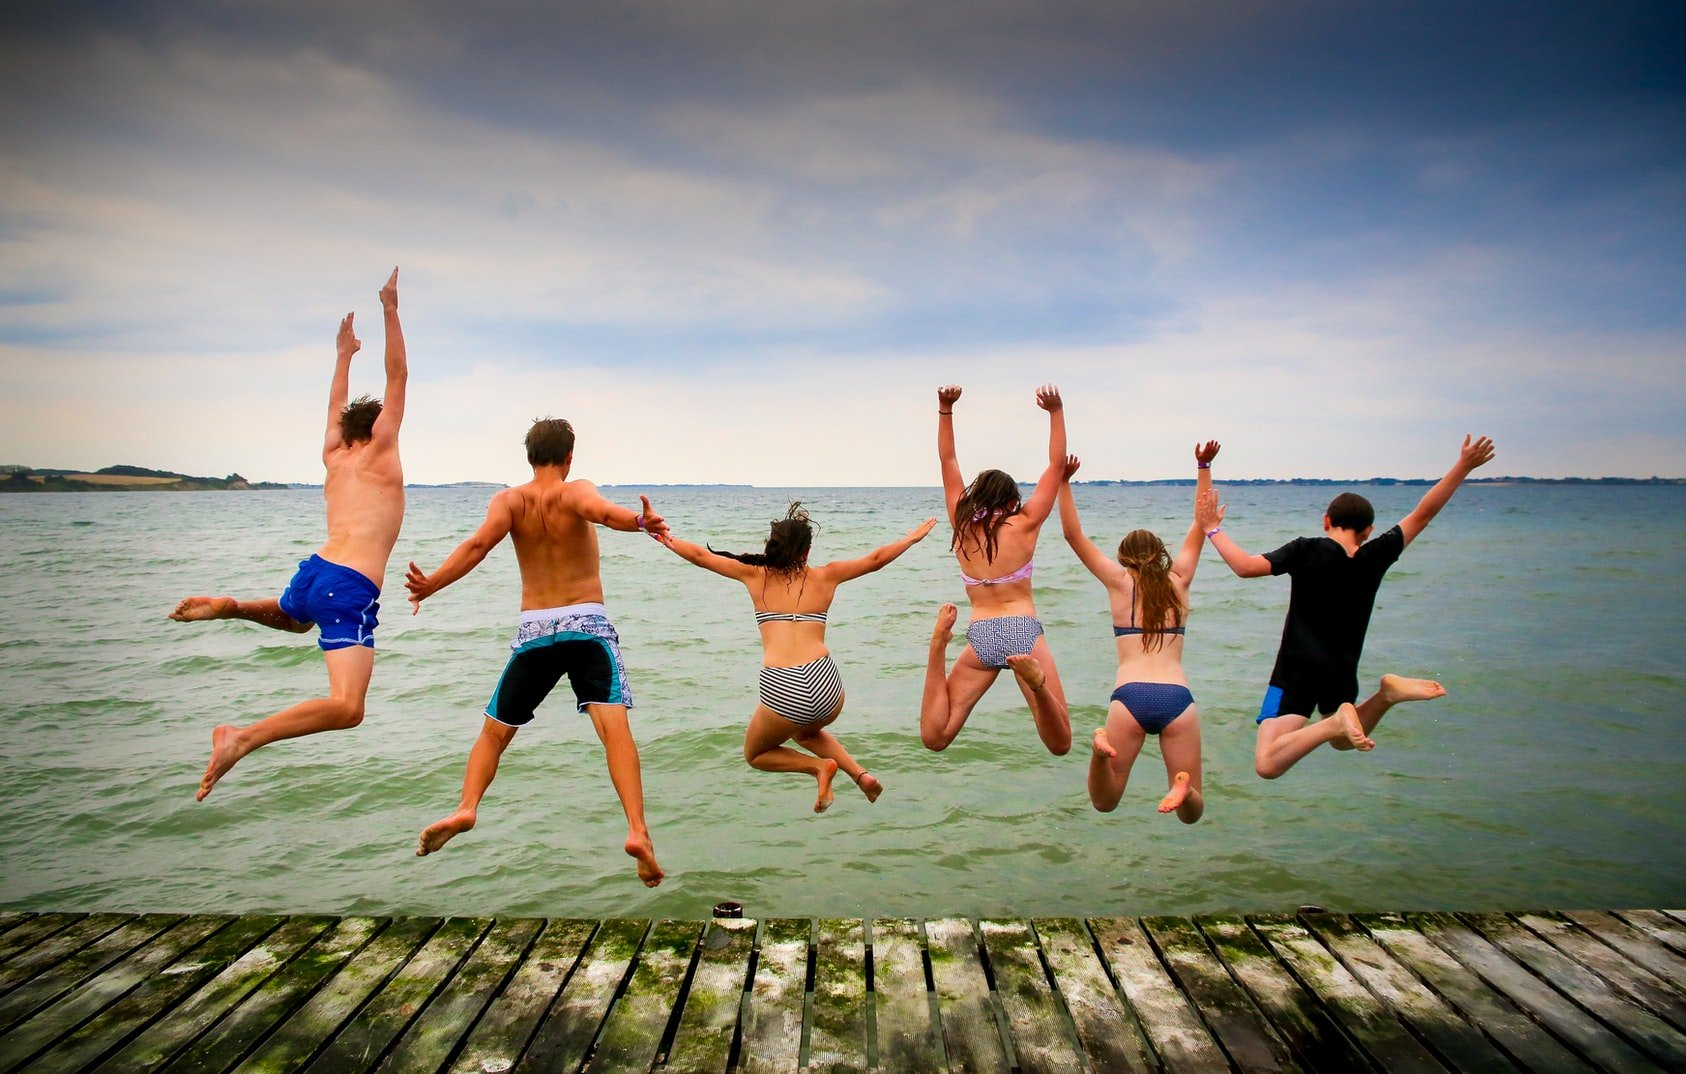 Strandspass auf Fünen in Dänemark